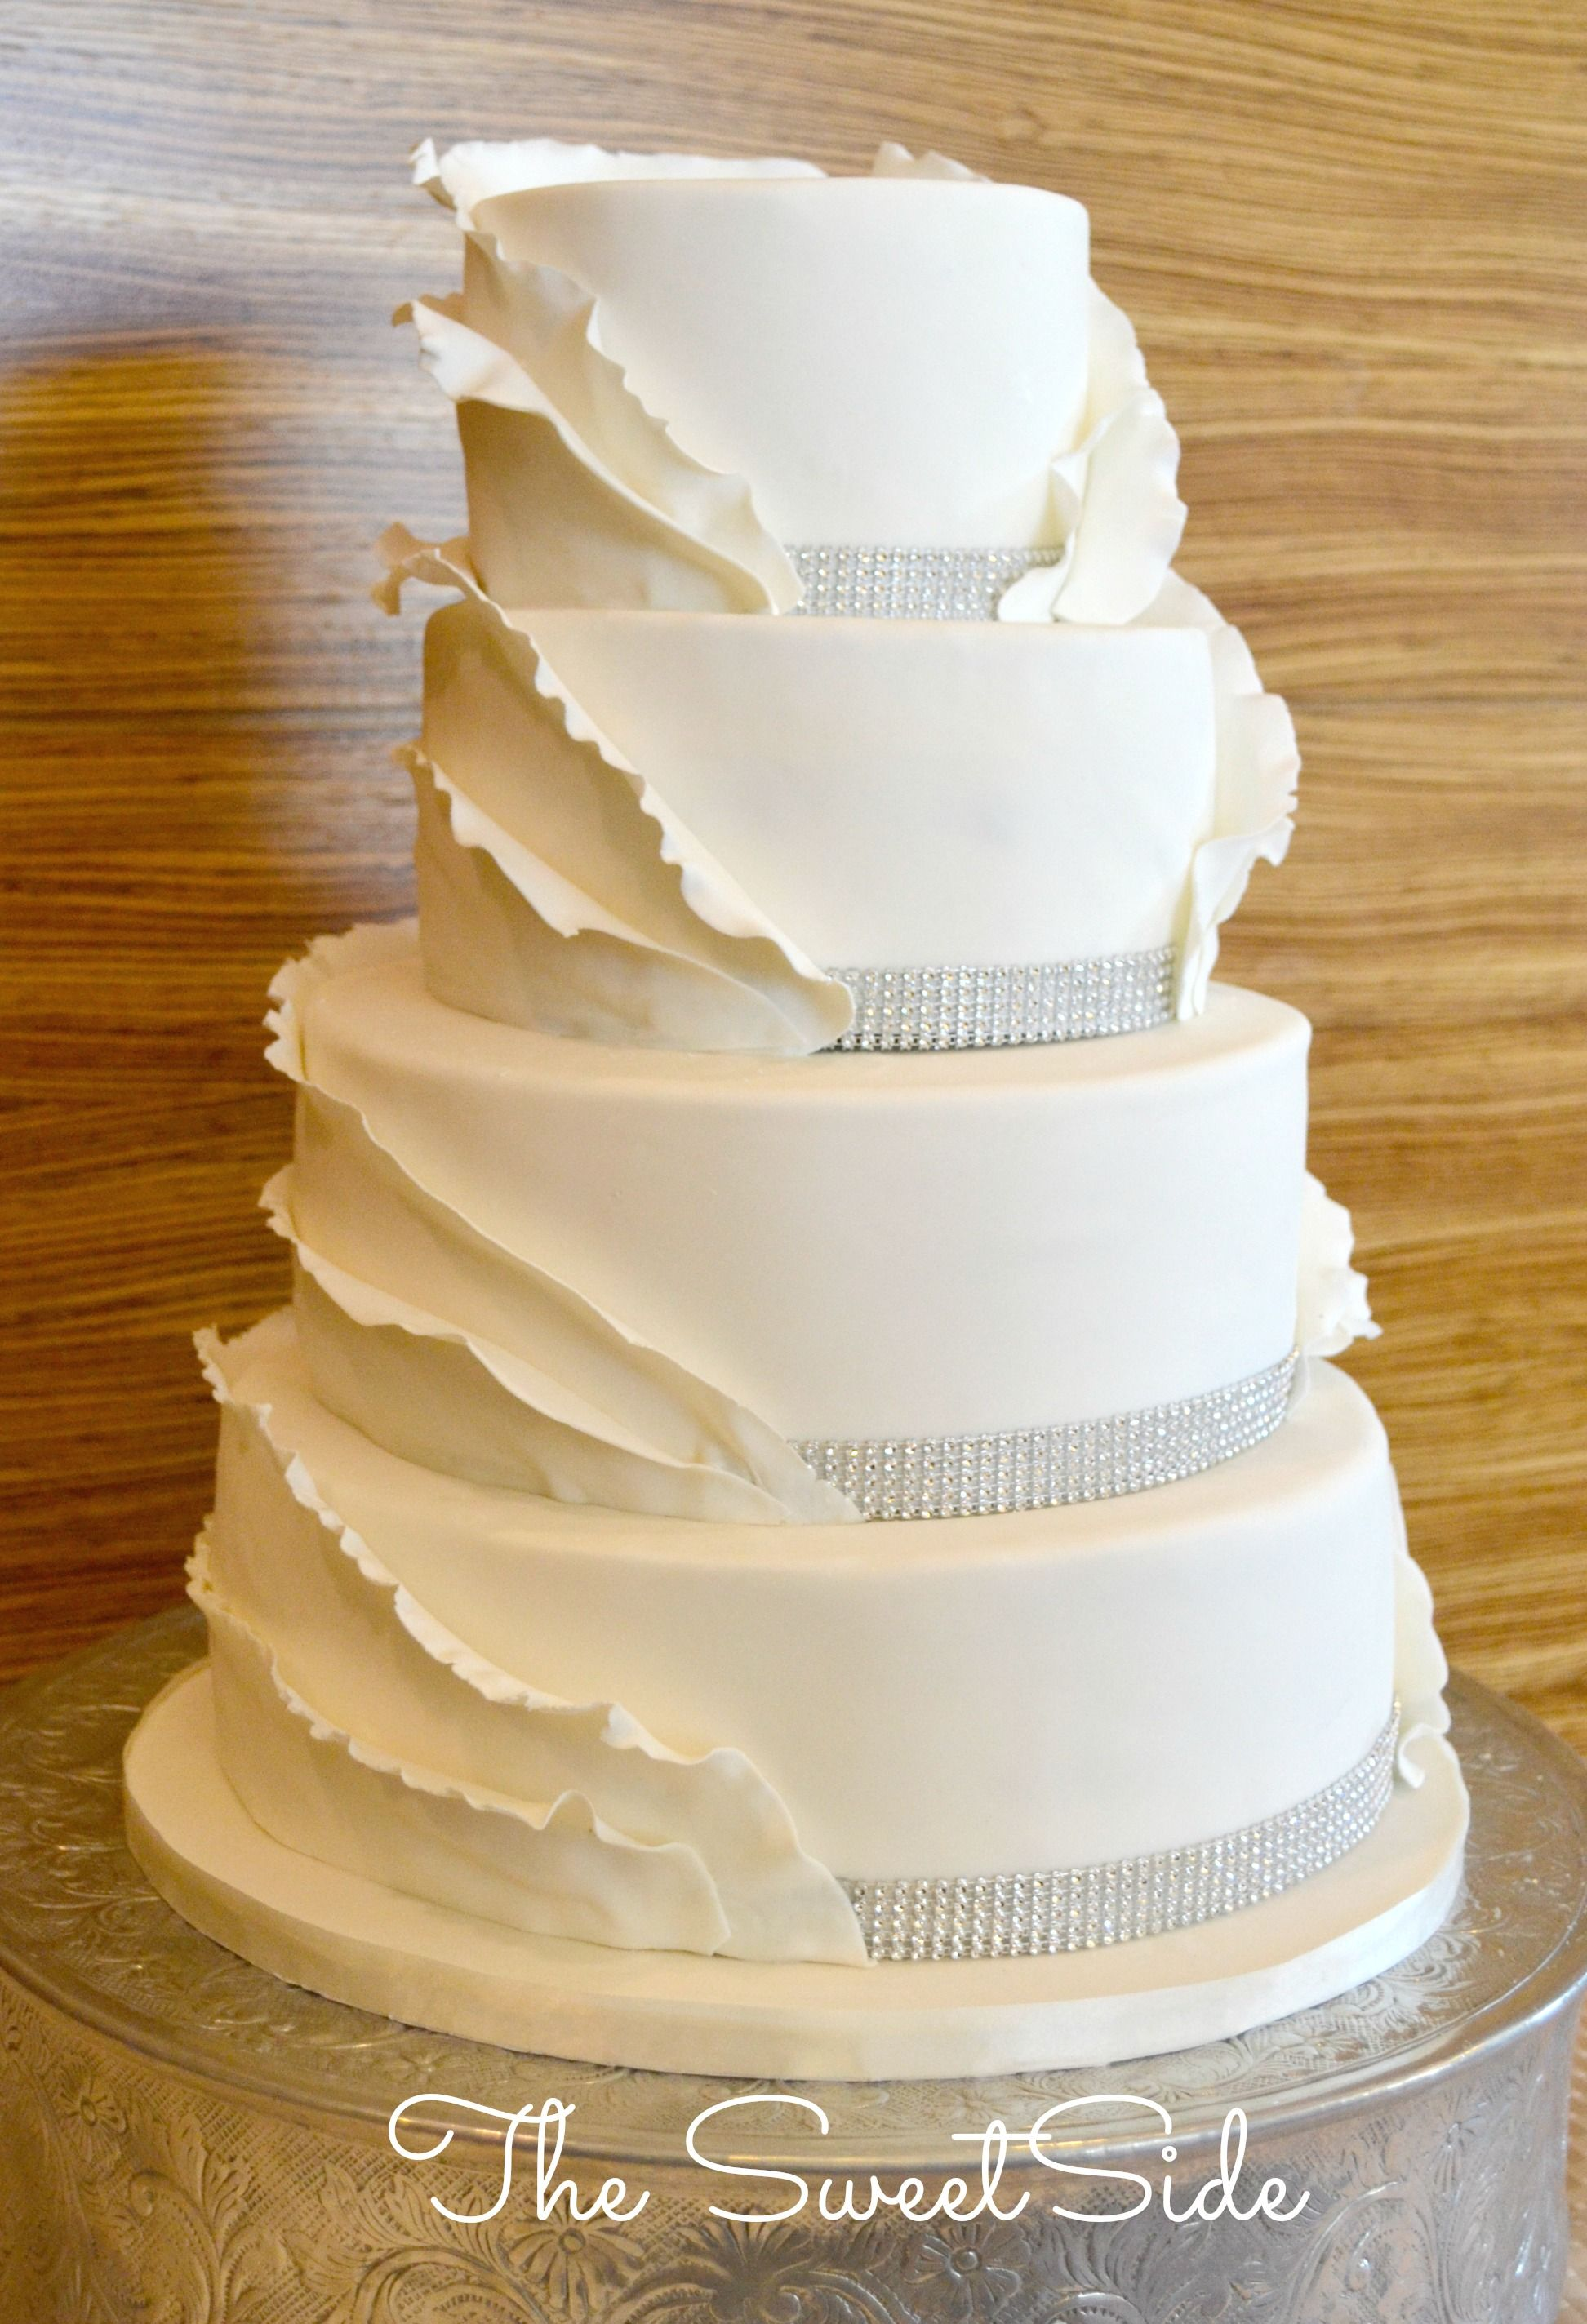 Couture Wedding Cake The SweetSide, Seattle, WA www